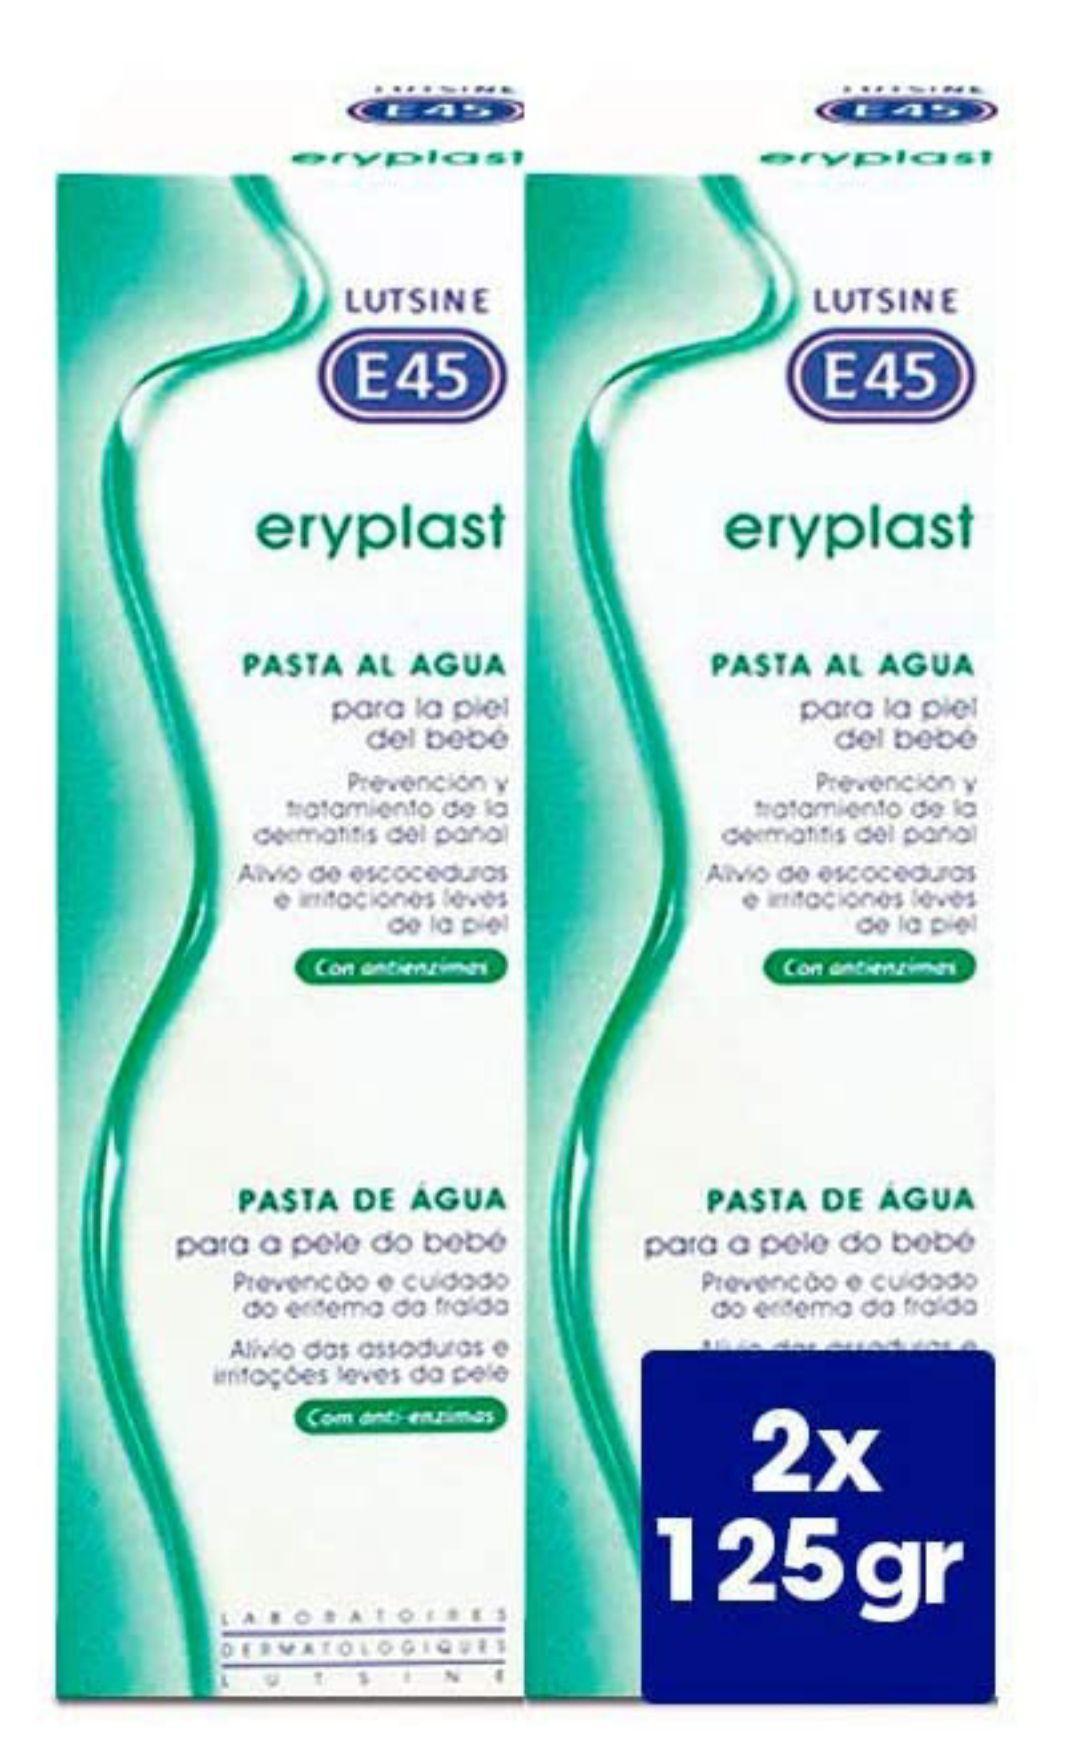 Pasta al agua Eryplast - Crema pañal bebé 2x125g